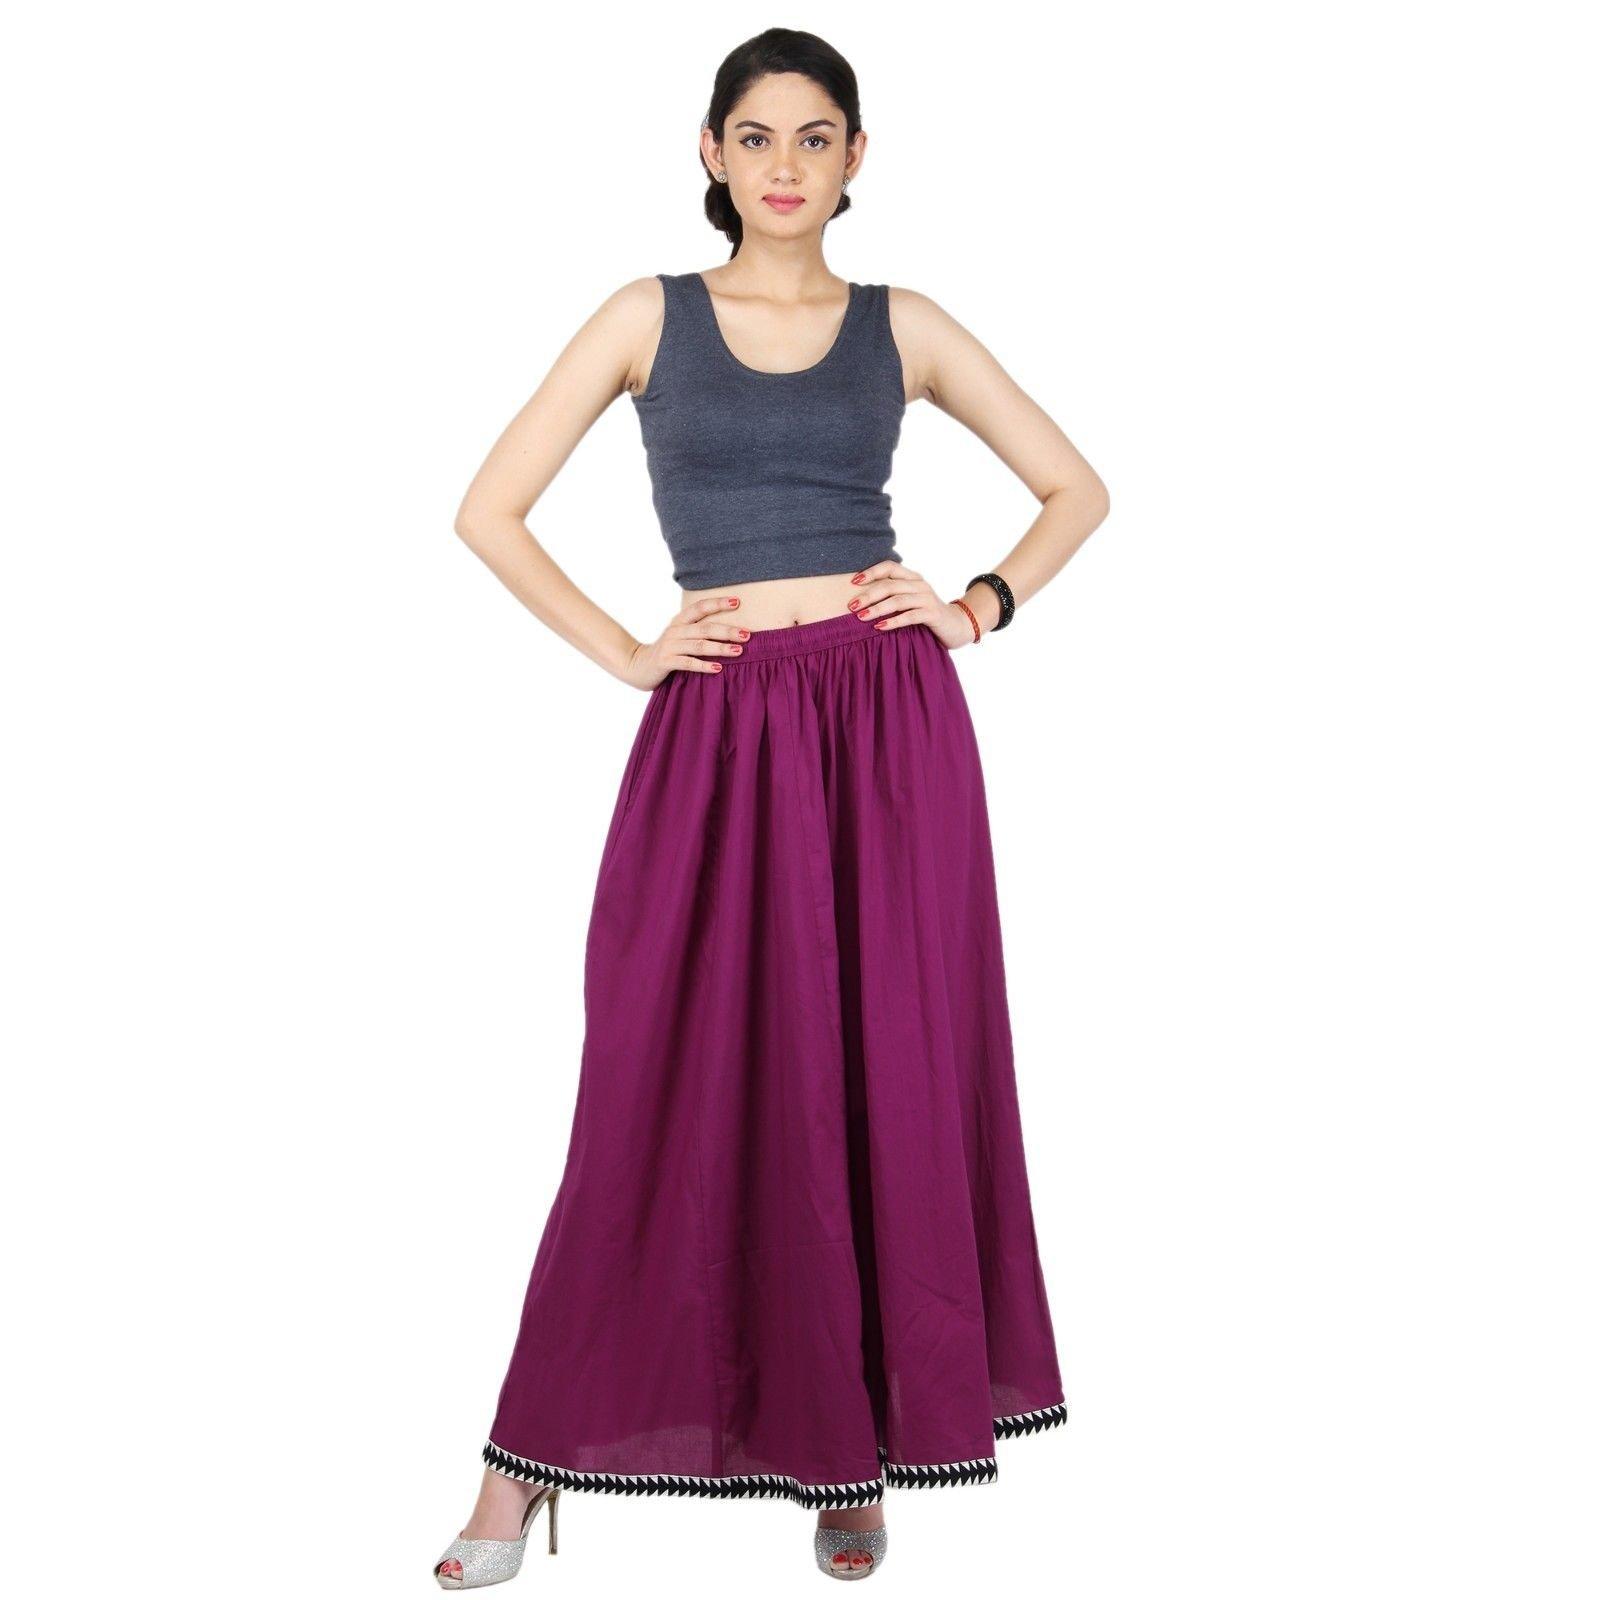 Purple Cotton Extra Wide Leg Pant, Divider Palazzo Pant, Harem, Comfy Skirt